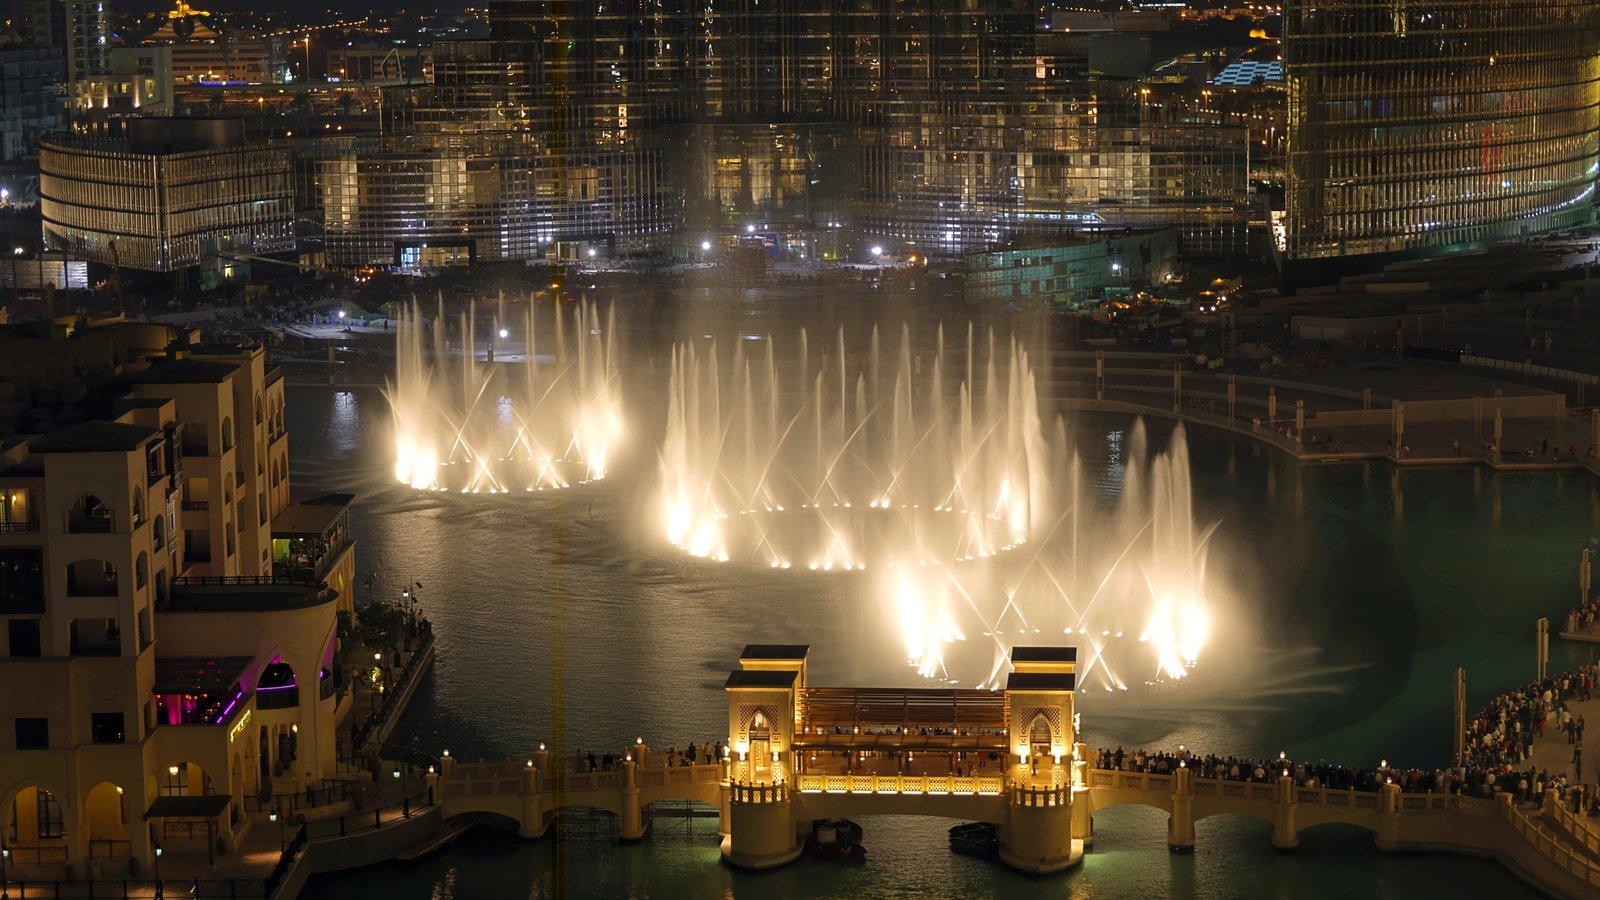 The Dubai Fountain featuring a fountain, night scenes and a city